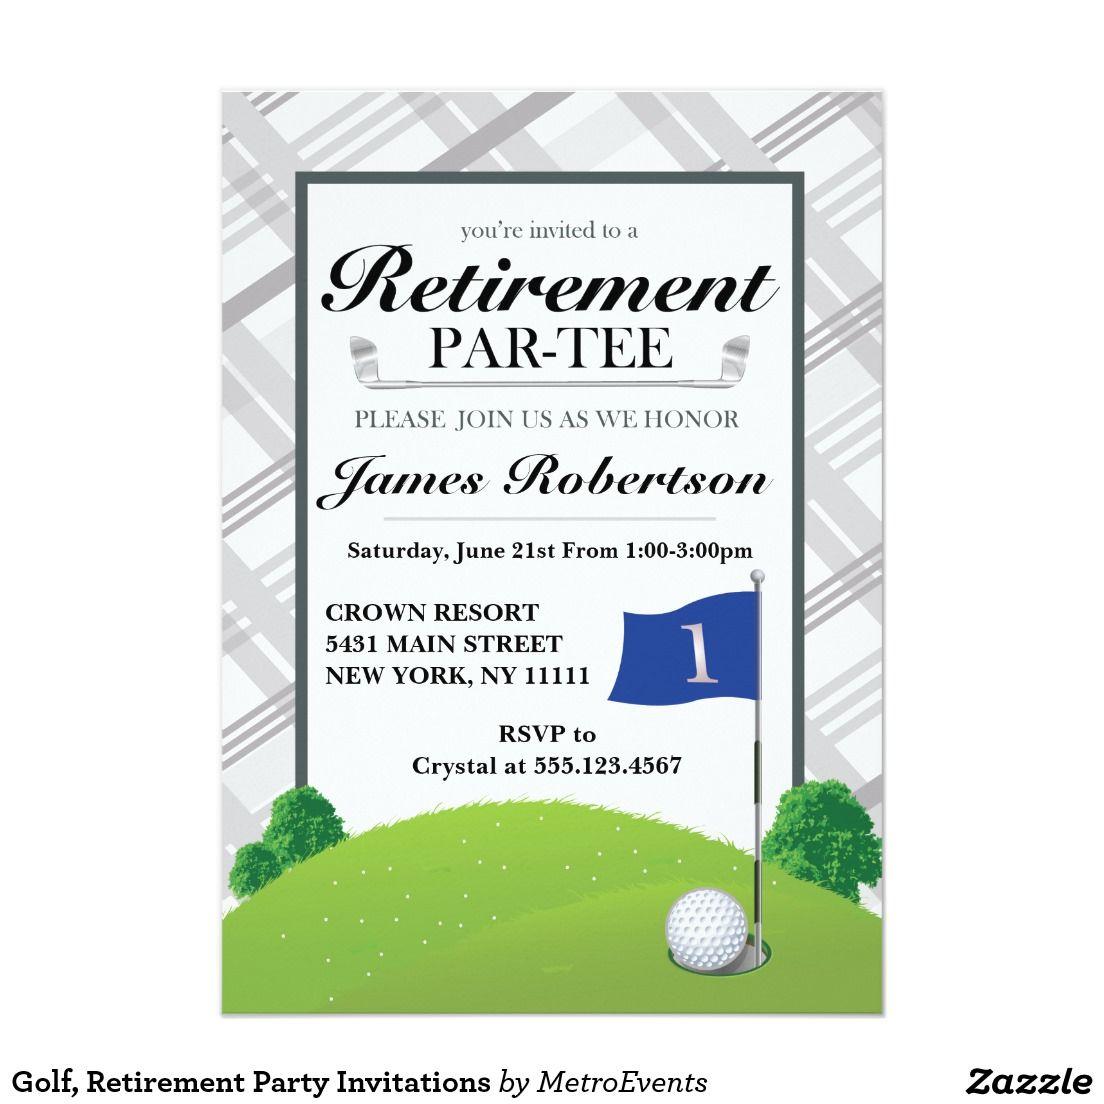 golf retirement party invitations metro. Black Bedroom Furniture Sets. Home Design Ideas